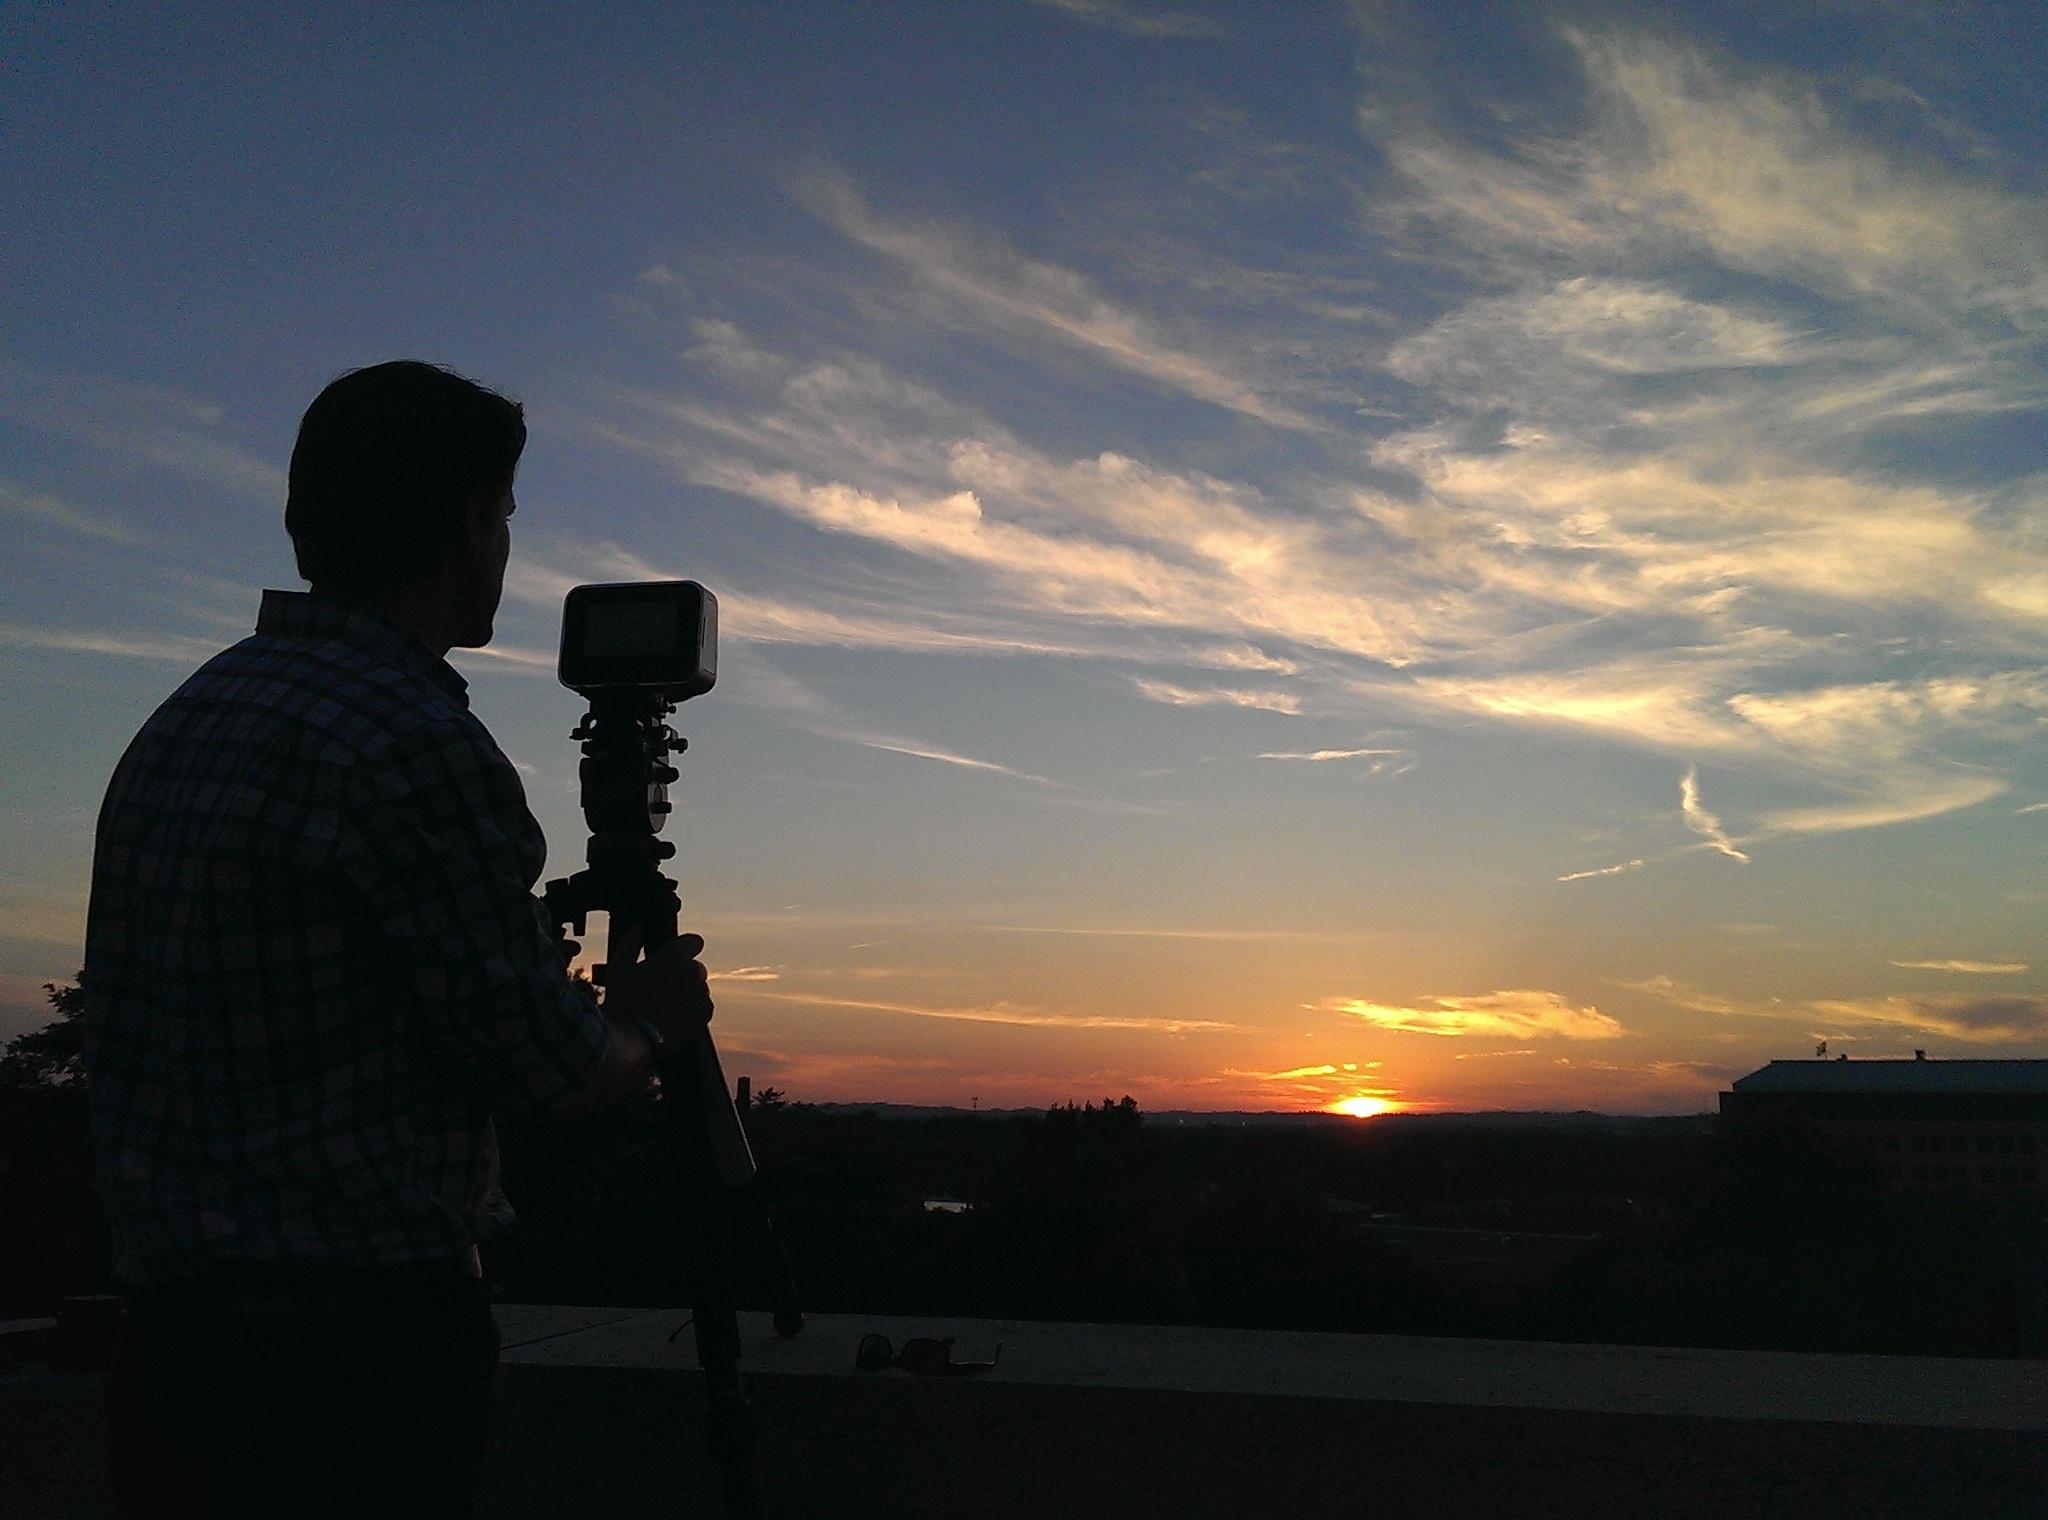 The Blackmagic Cinema Camera in a News Environment 14